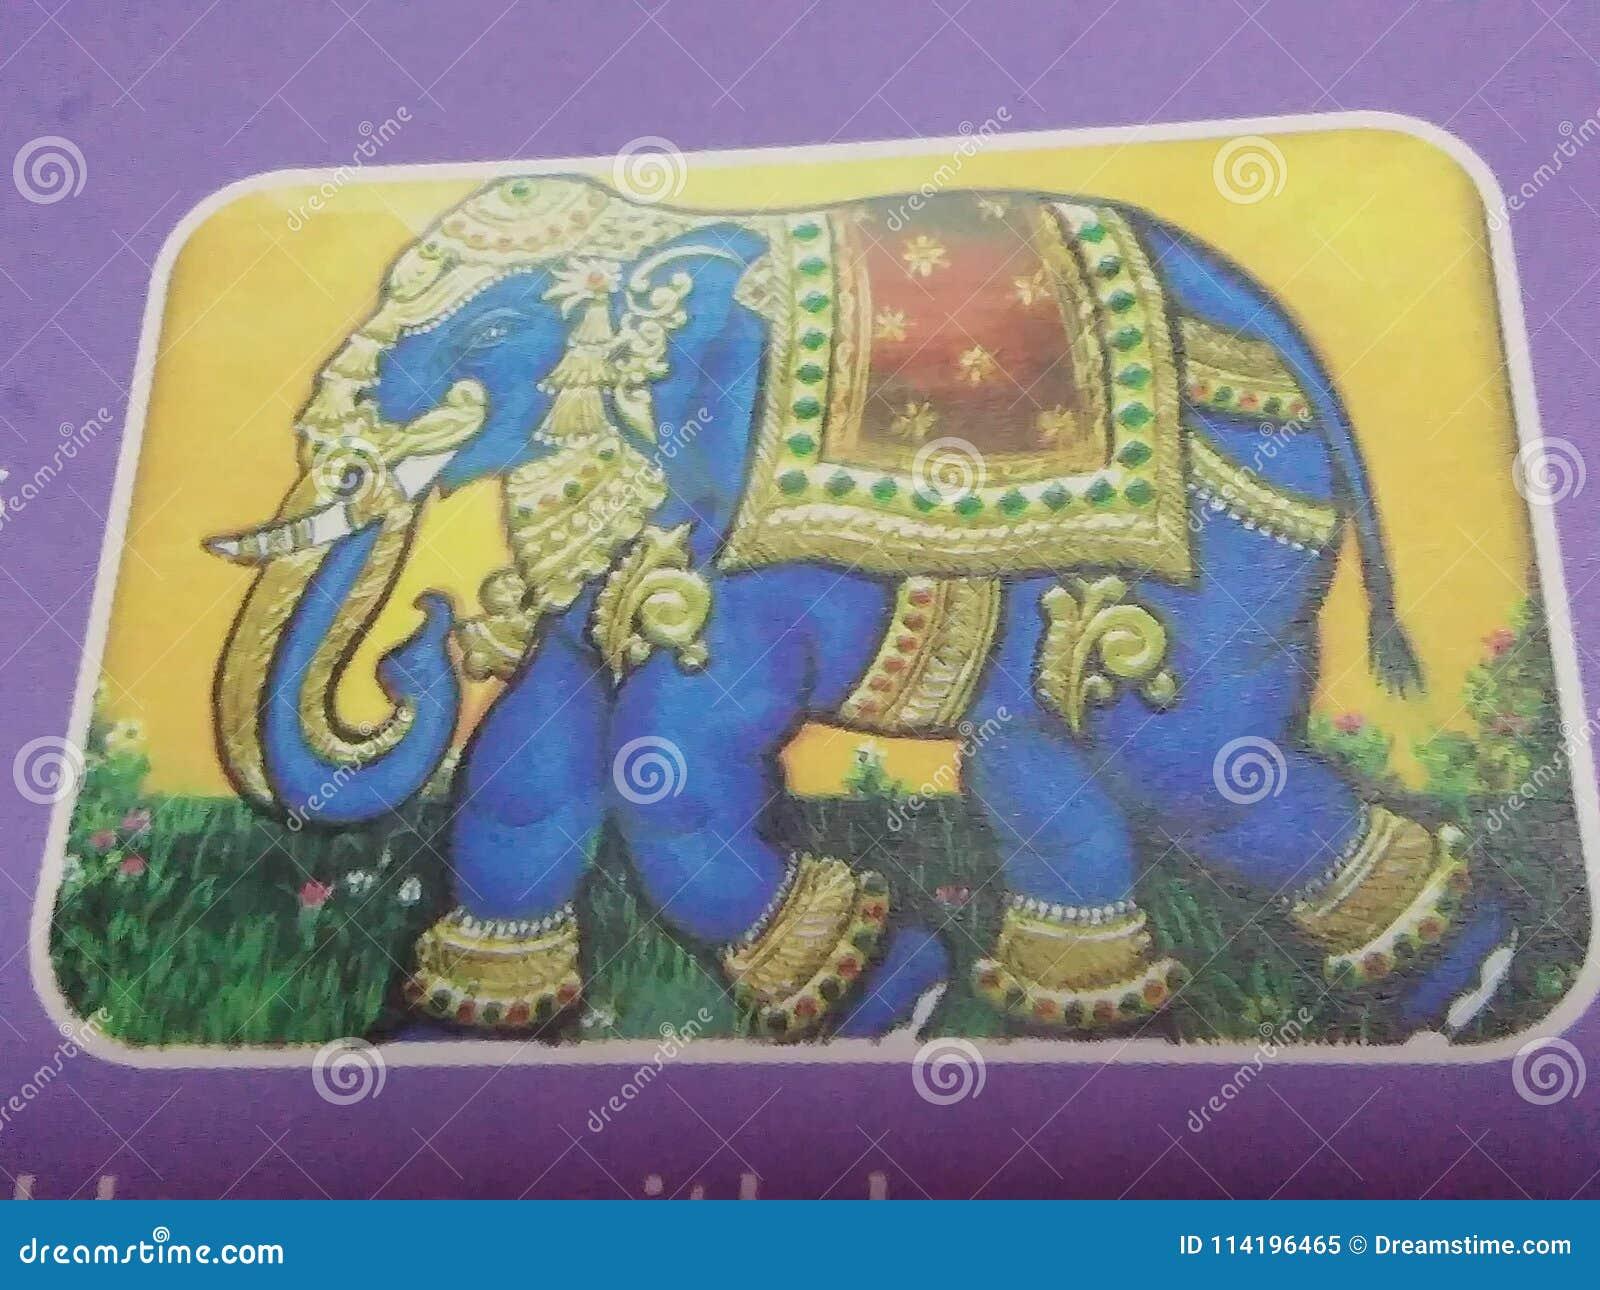 elephant for king